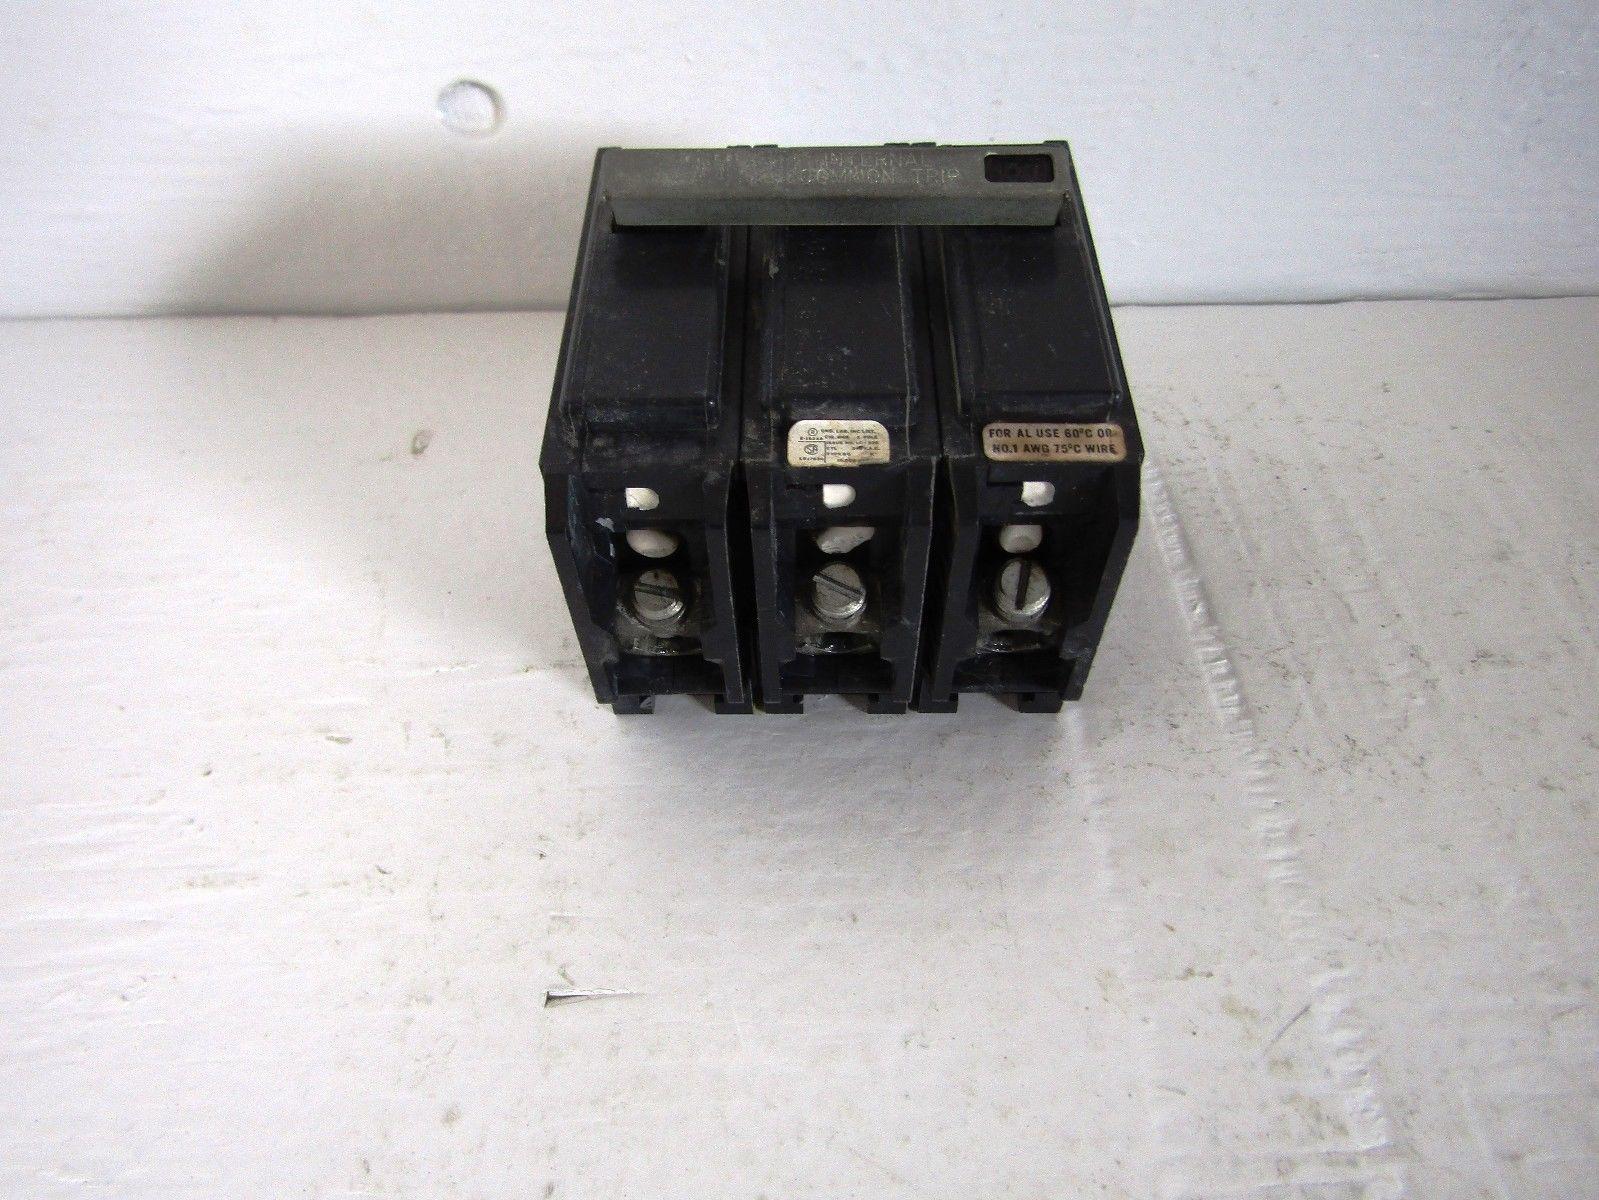 ZINSCO/GTE/SYLVANIA BQ3-D100 3 POLE 100 AMP 240 VOLT CIRCUIT BREAKER ...